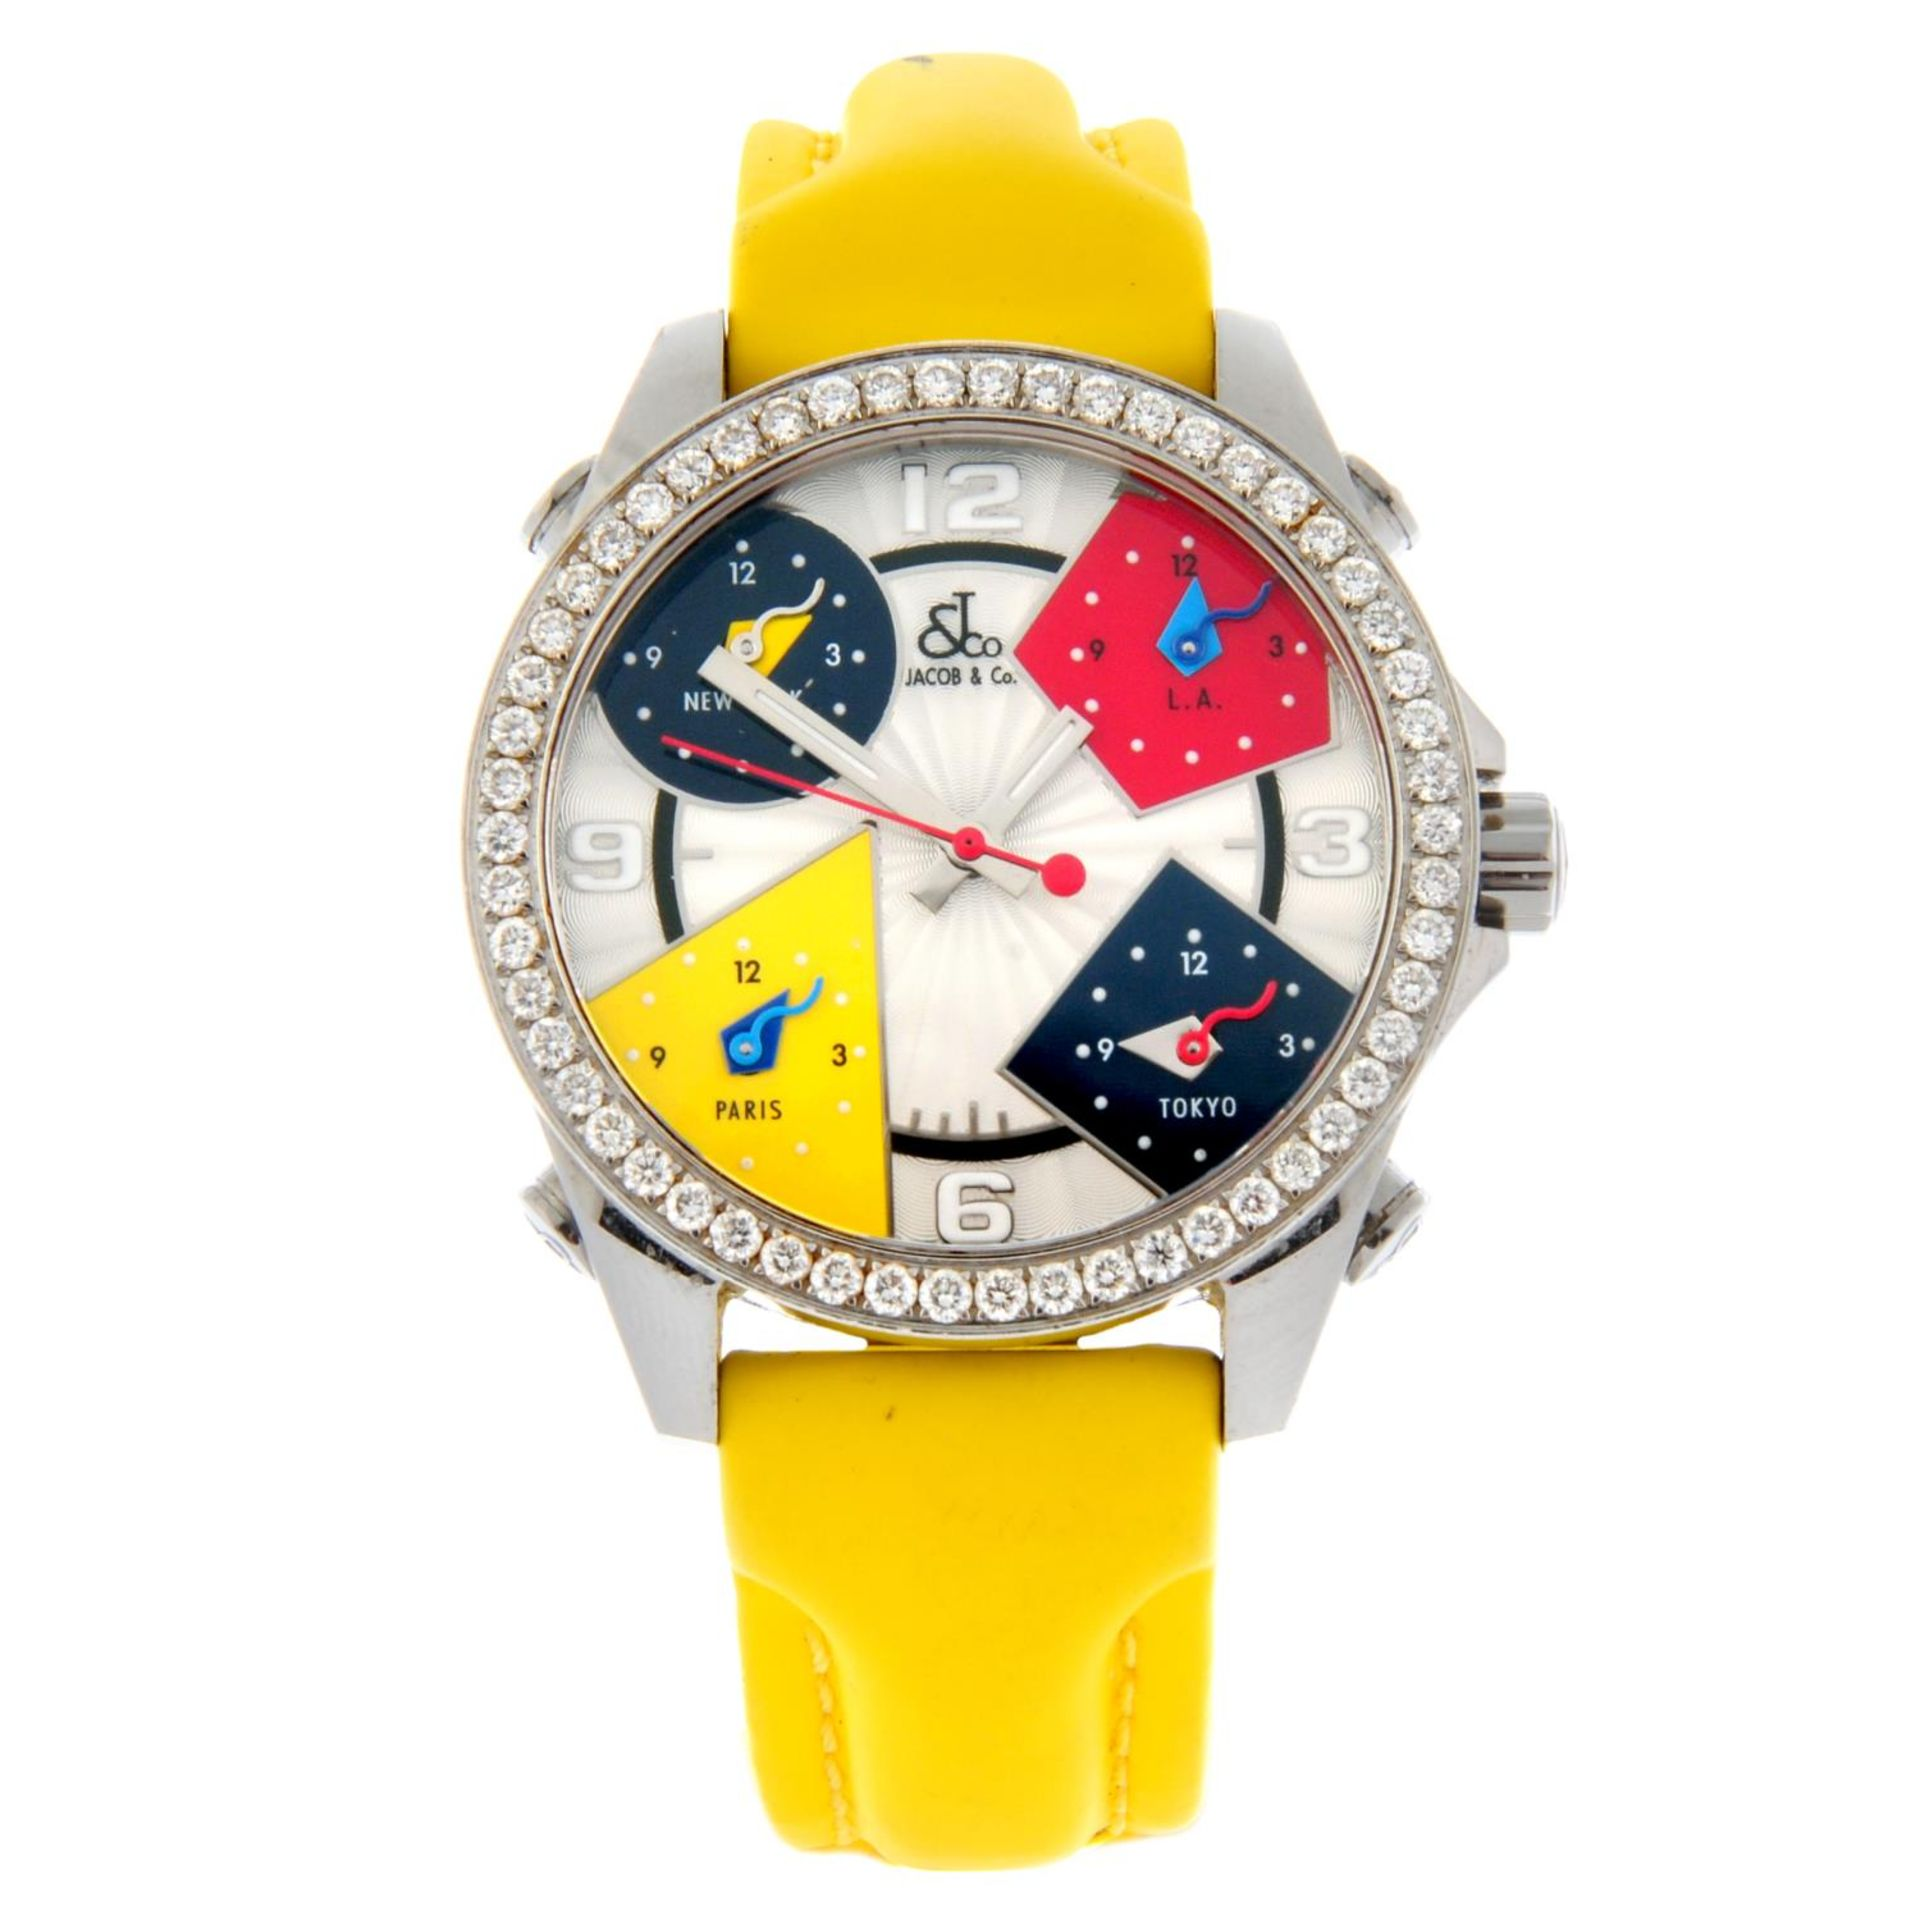 JACOB & CO. - a Five Time Zone wrist watch.